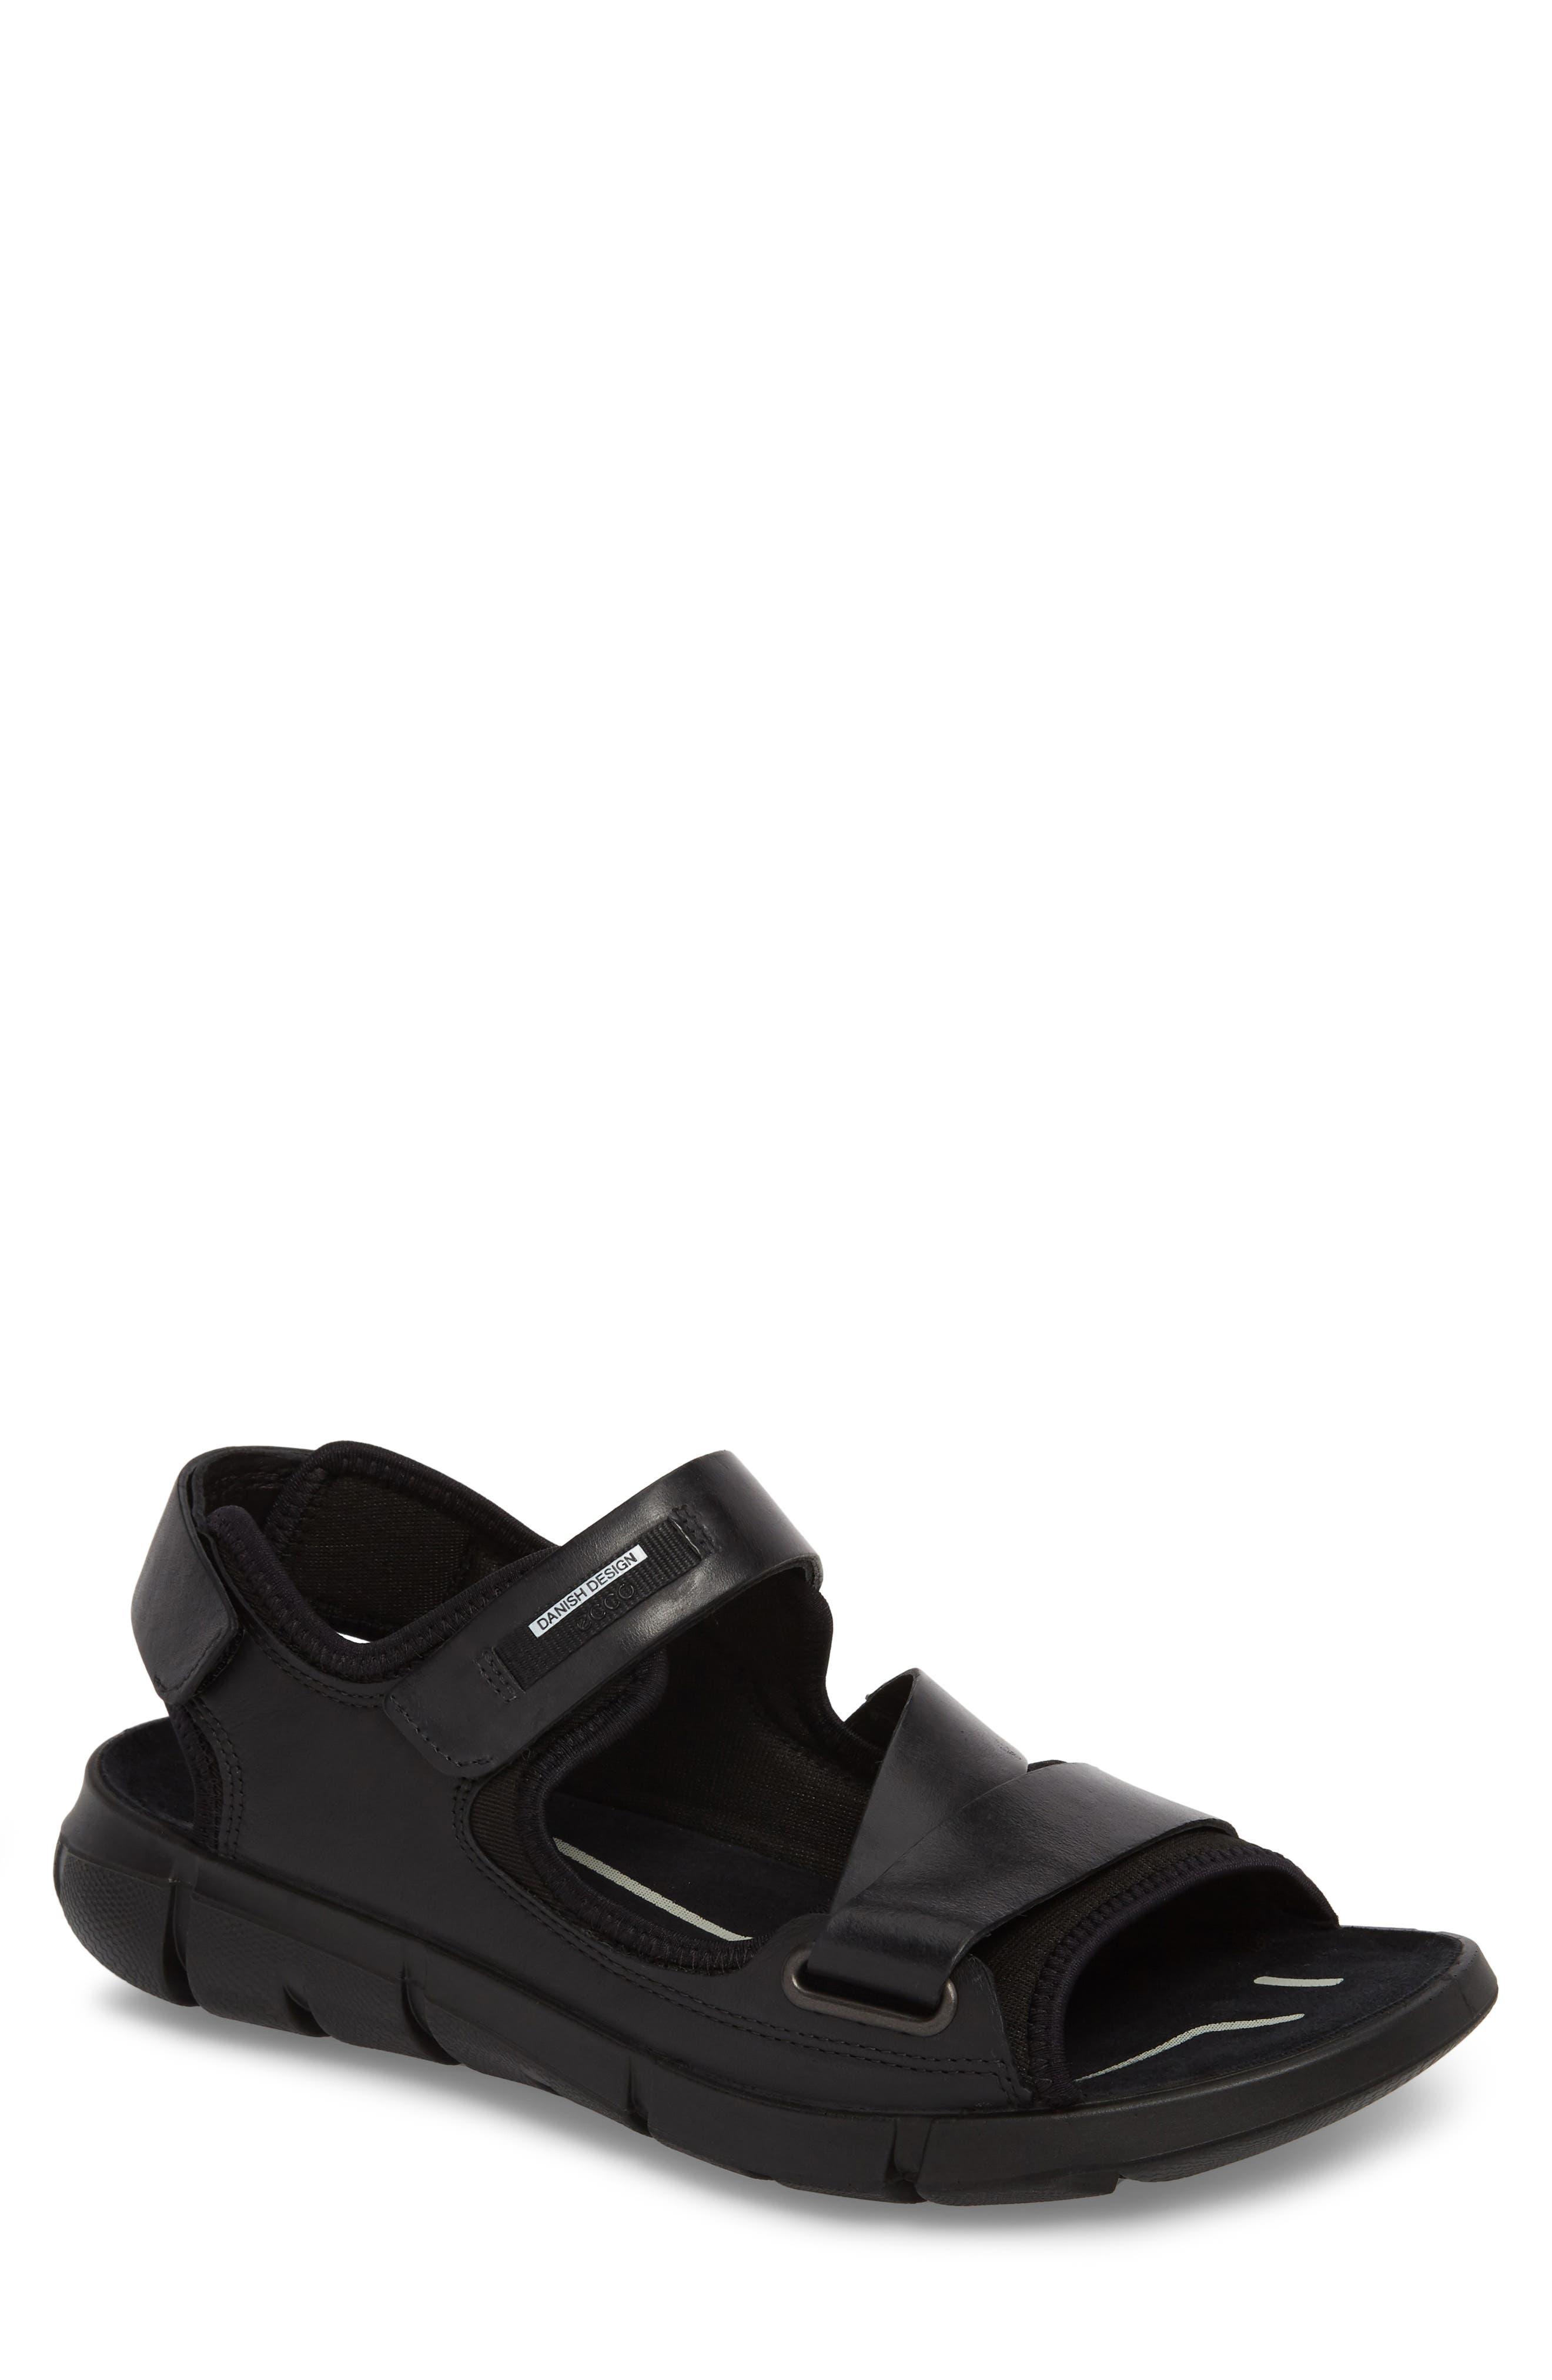 Intrinsic 2 Sandal,                         Main,                         color, 001